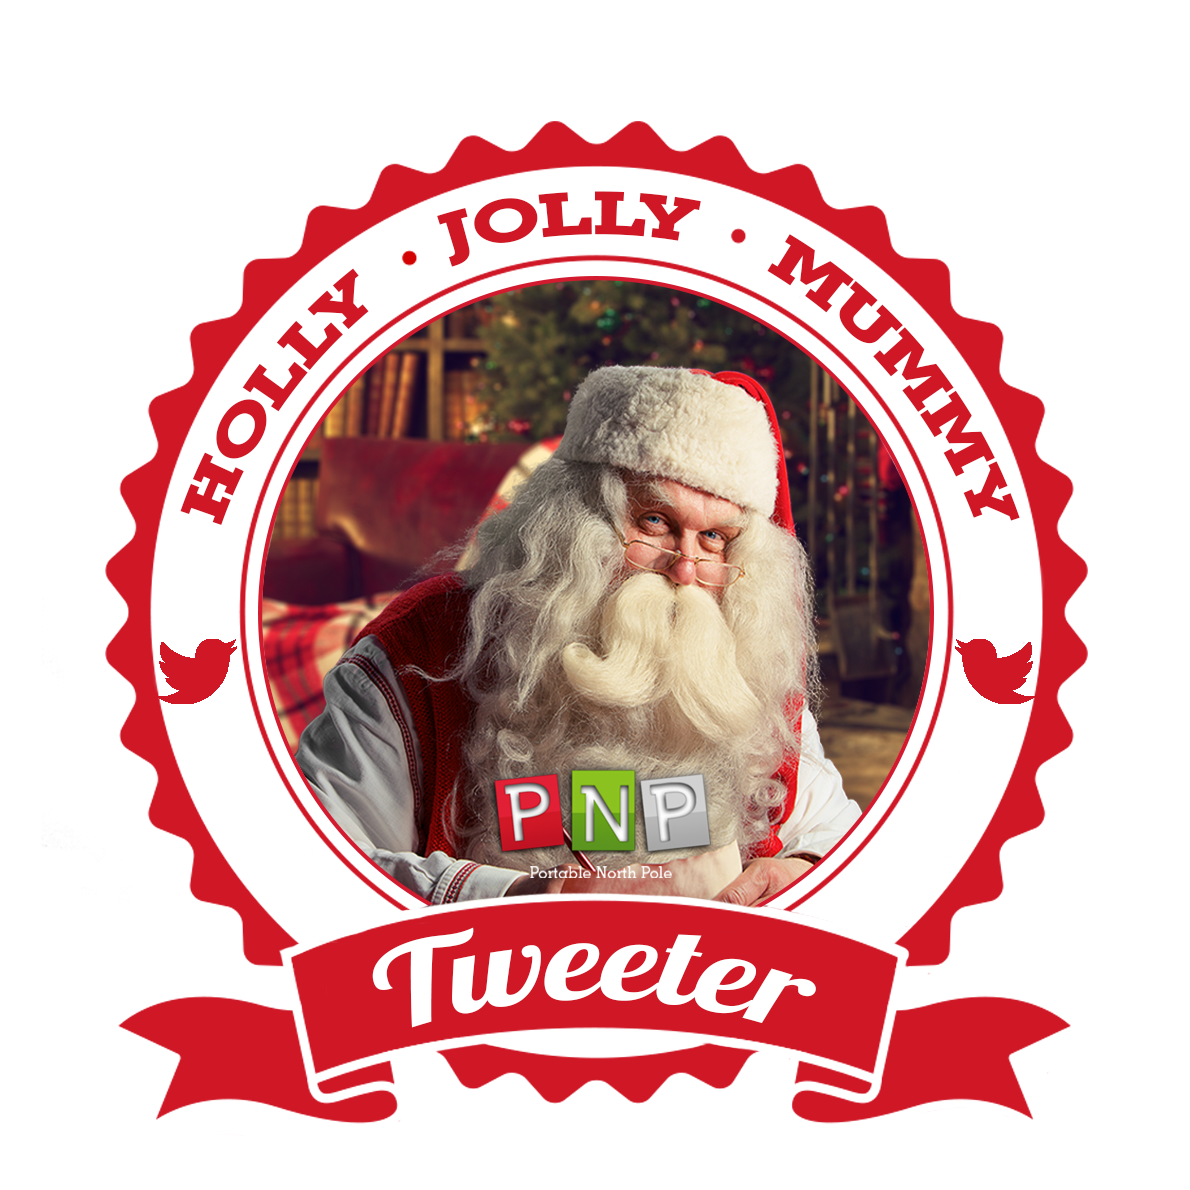 I'm A Holly Jolly Mummy PNP Tweeter